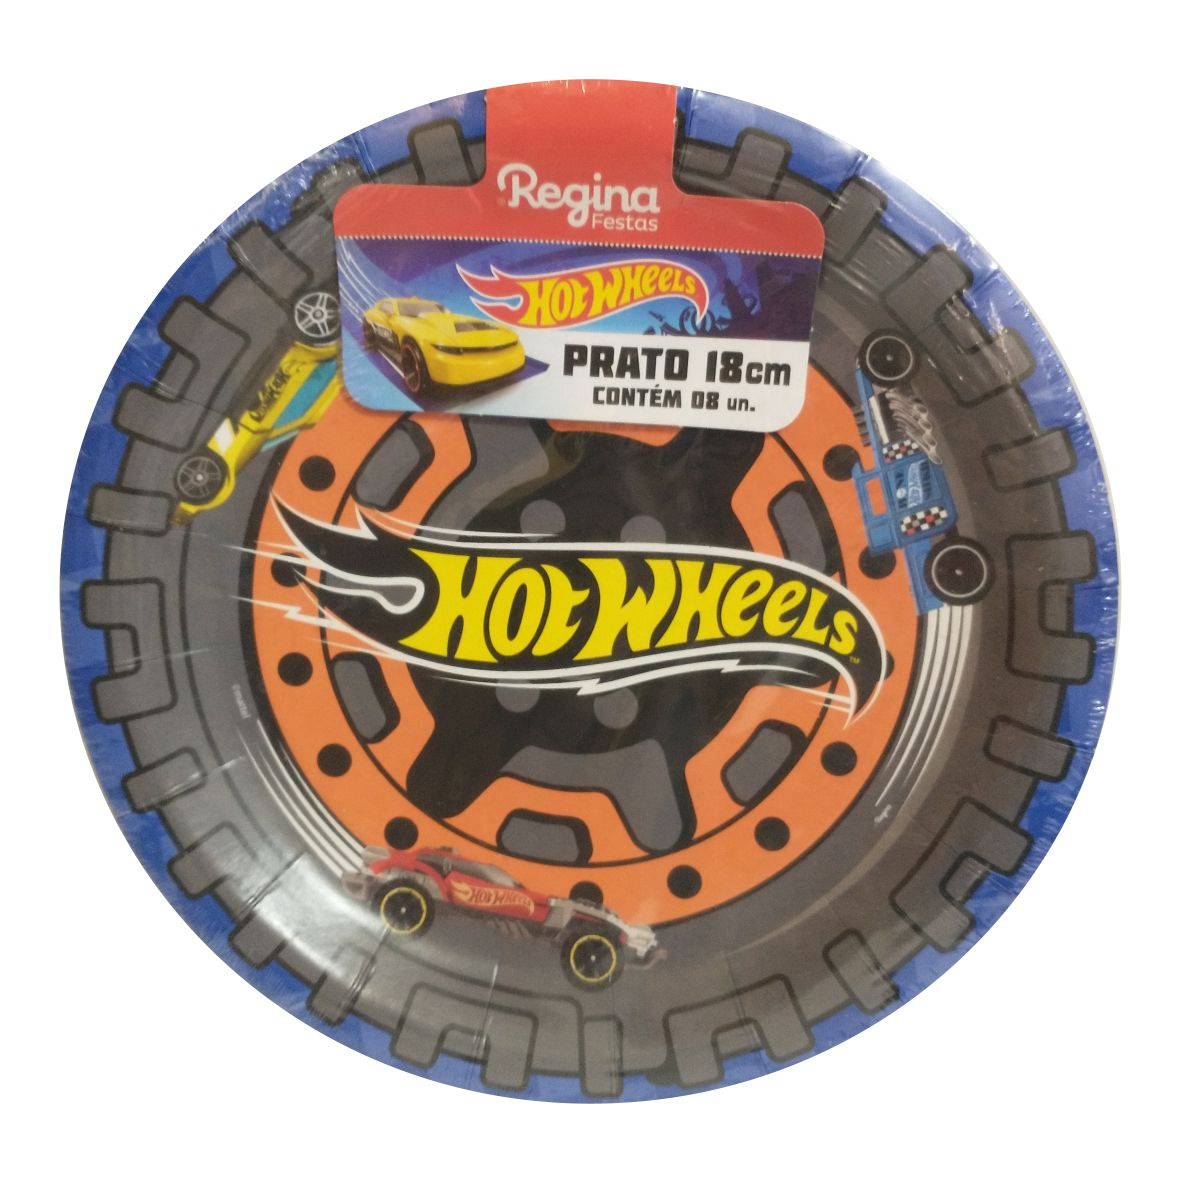 Prato Hot Wheels 18cm - pct c/ 08 unidades - Regina Festas